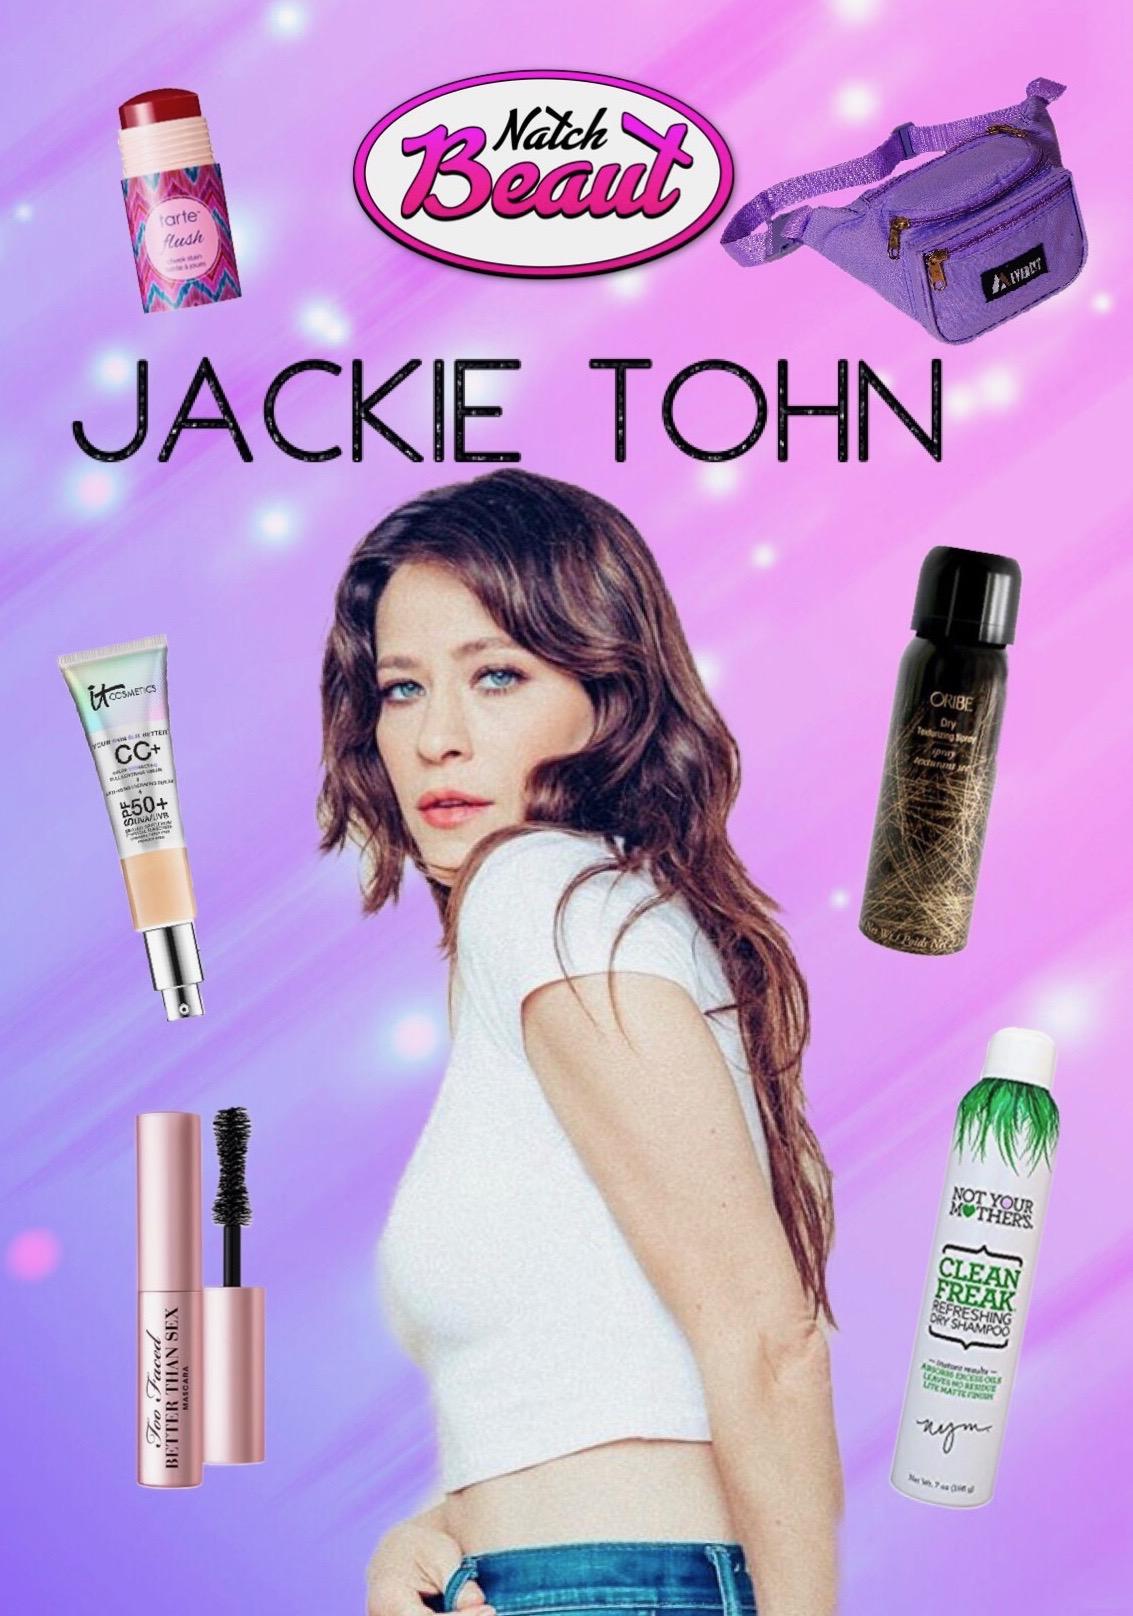 Jackie Tohn